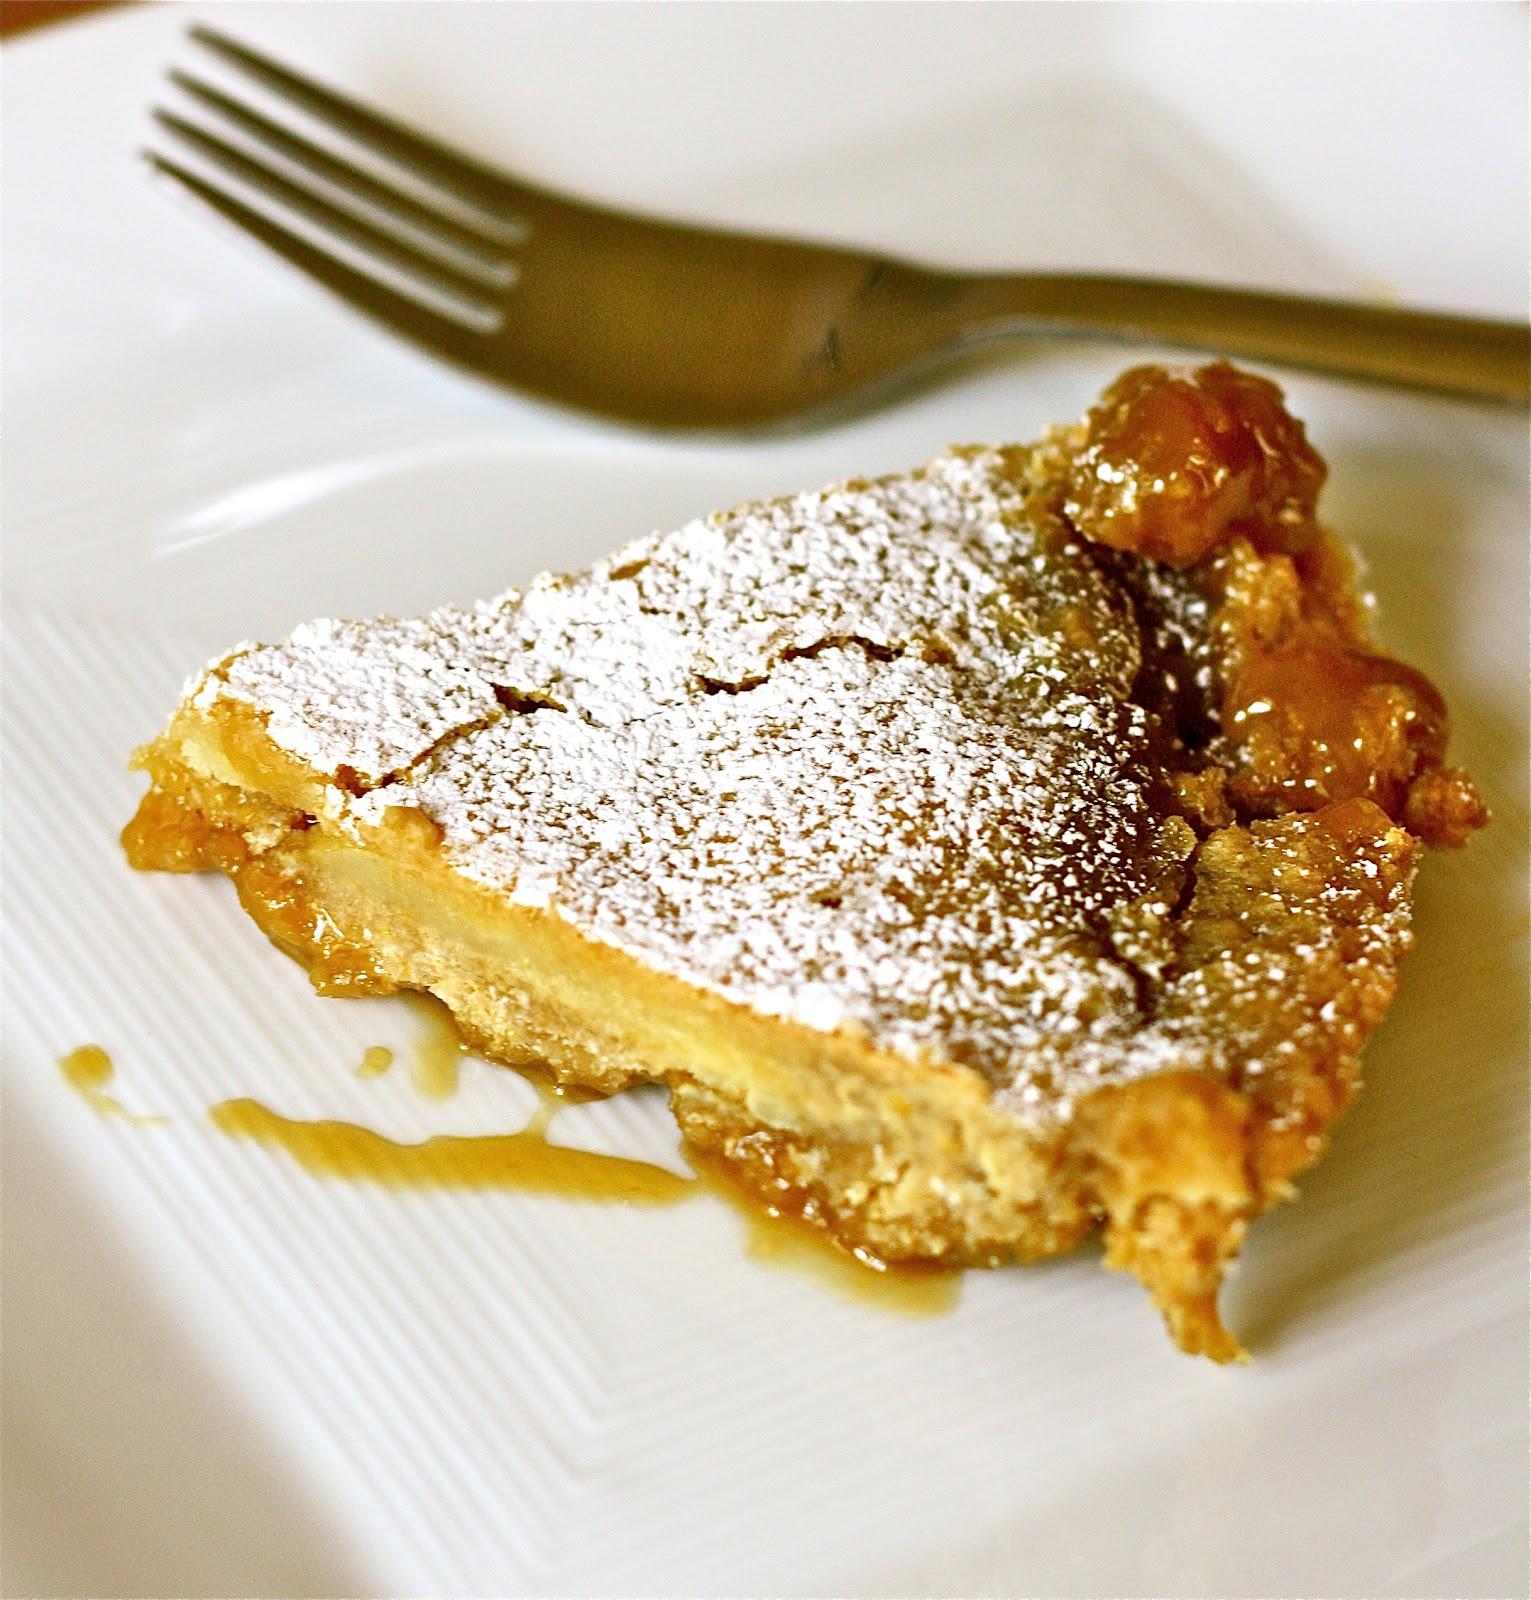 momofuku milk bar crack pie review